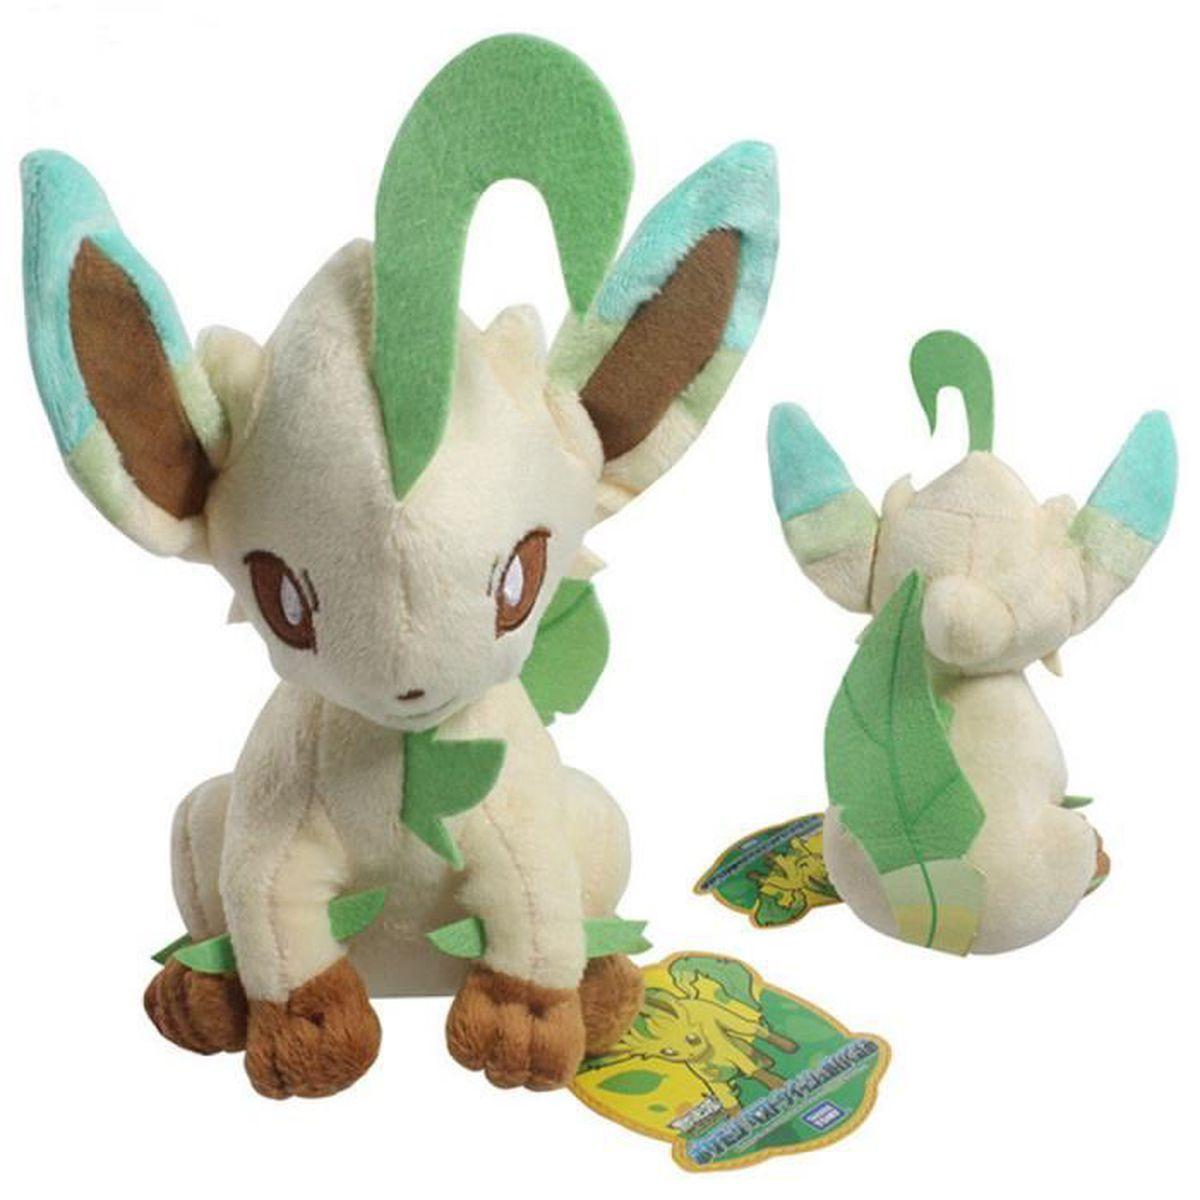 9 pcs set pokemon evoli famille en peluche animaux empaill s espeon voltali aquali flareon - Famille evoli pokemon ...